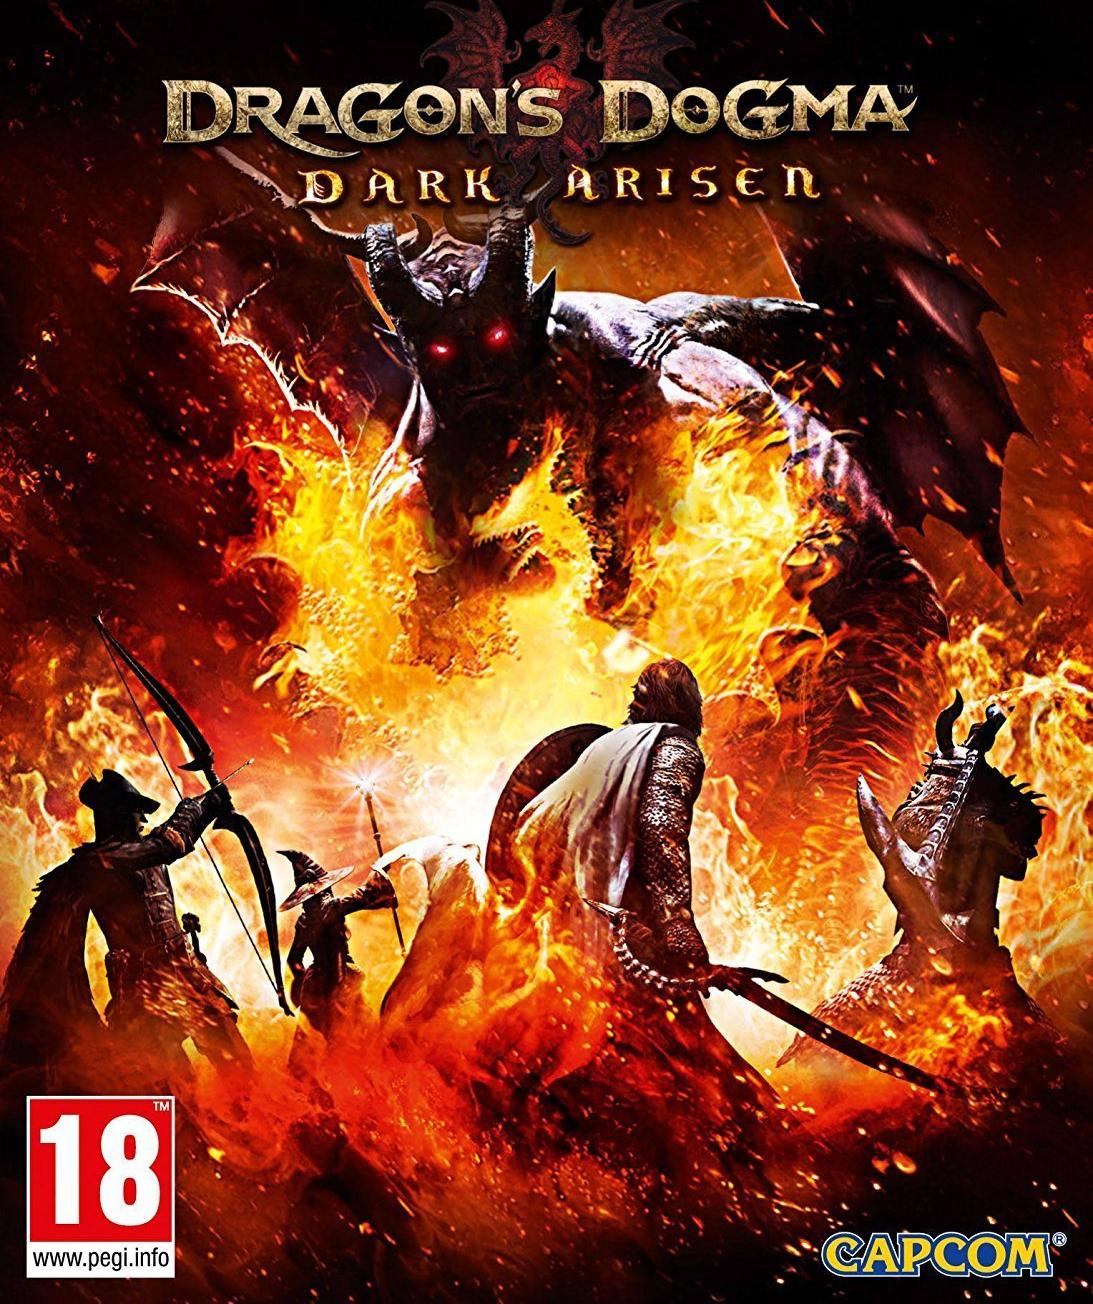 Dragon's Dogma: Dark Arisen [1.0.0.18 (12573)] (2016)